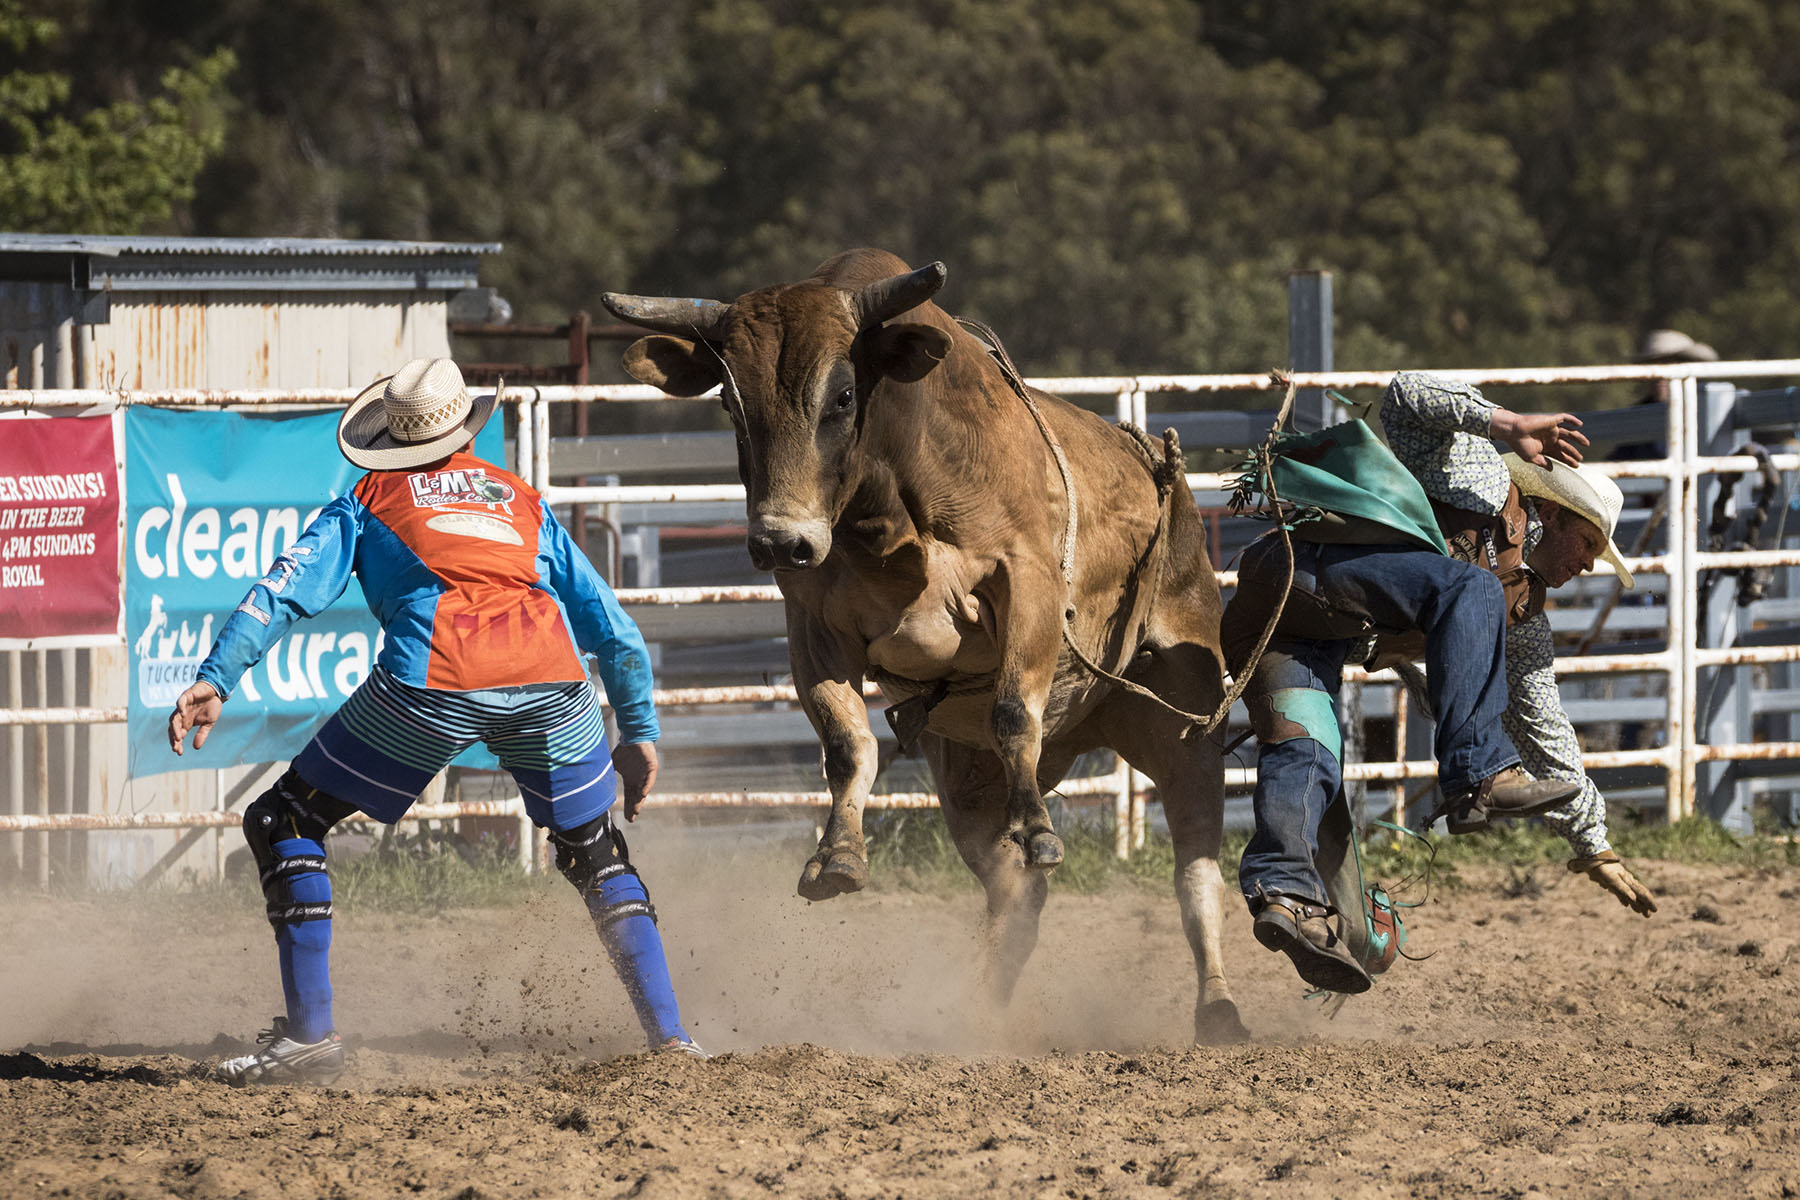 BrianJones_Rodeo Bull Riding_Bull Riding 4.jpg